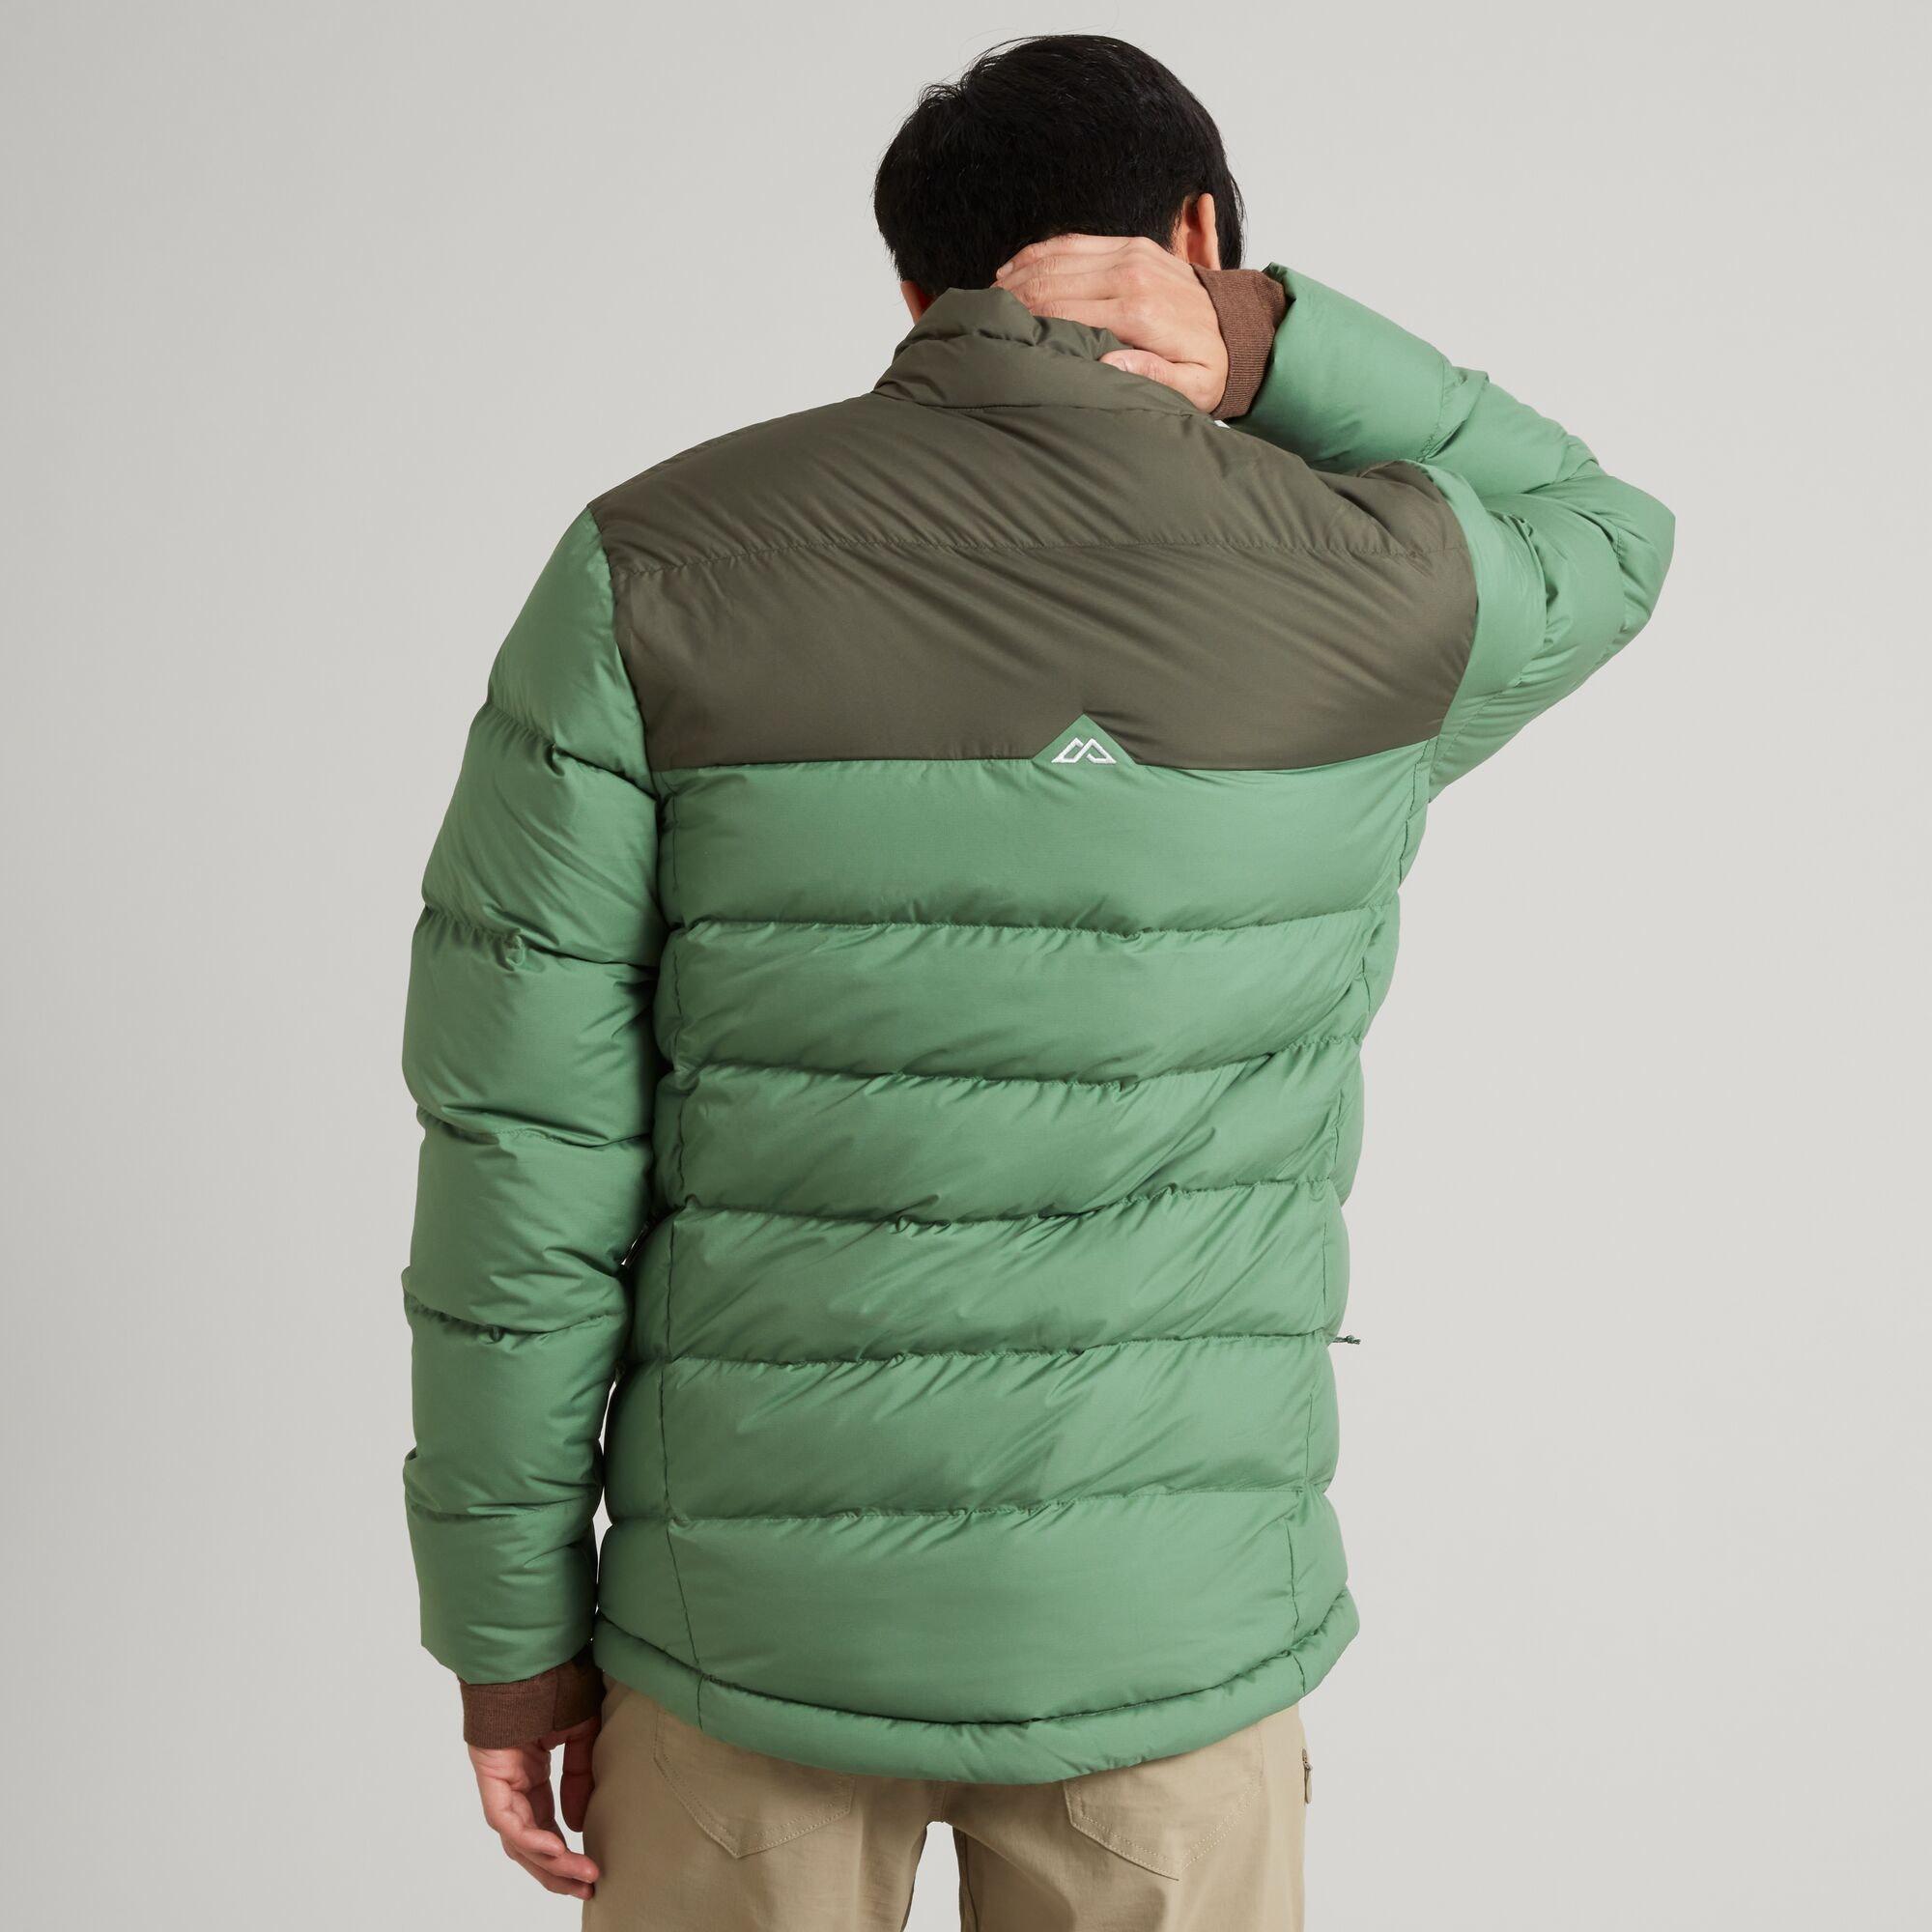 thumbnail 35 - NEW Kathmandu Epiq Mens 600 Fill Down Puffer Warm Outdoor Winter Jacket